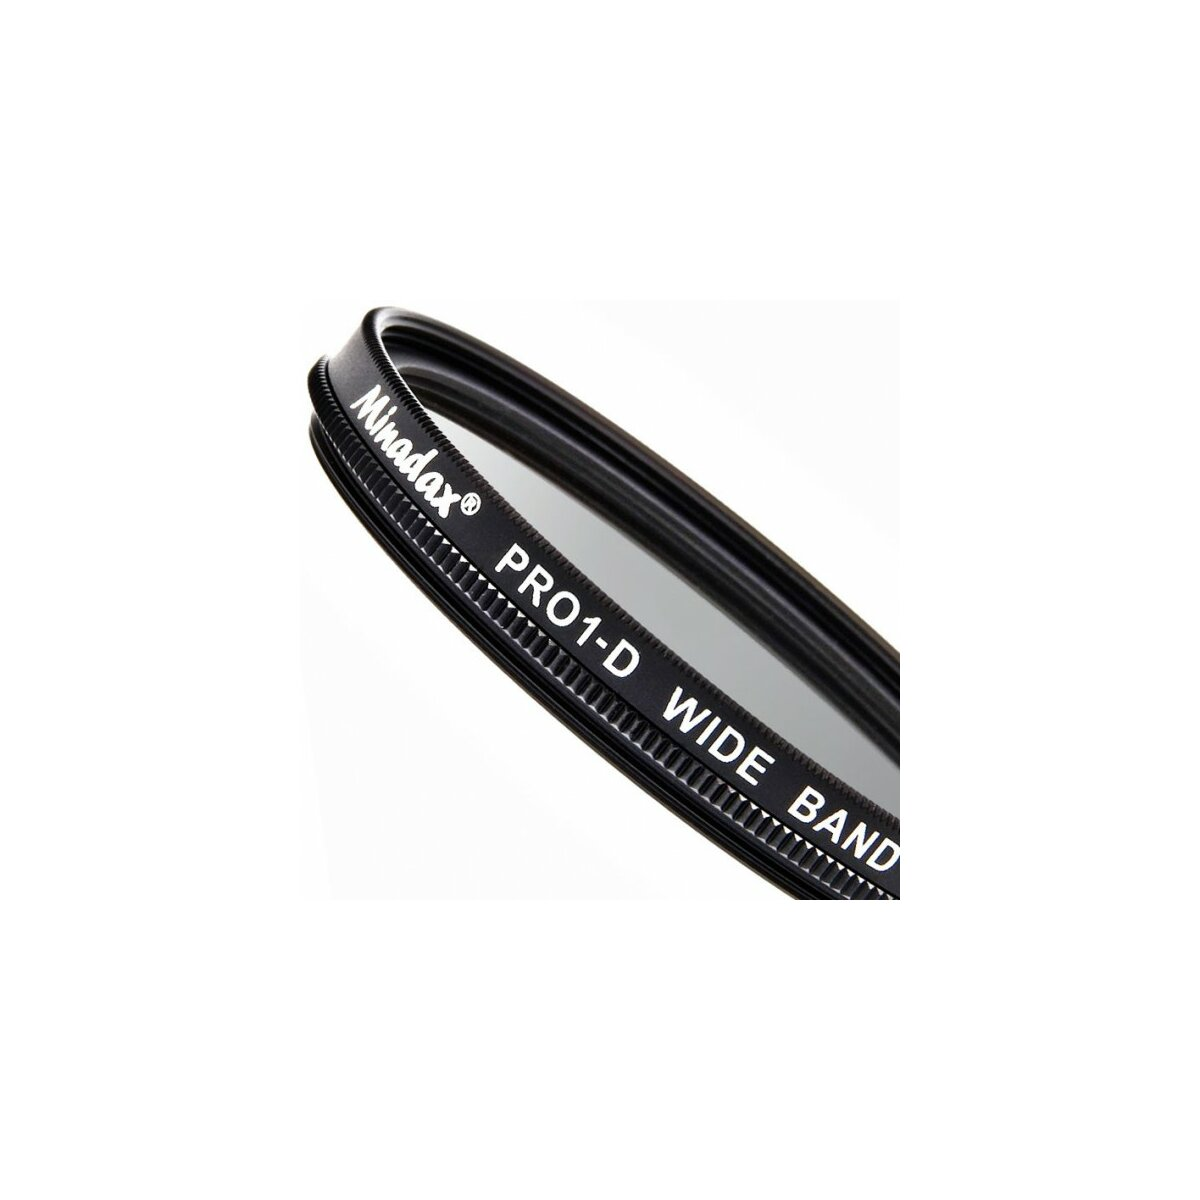 CPOL-Filter 52mm PRO-1D Slimline, ultraduenn Zirkular Polfilter - mehrfachverguetet